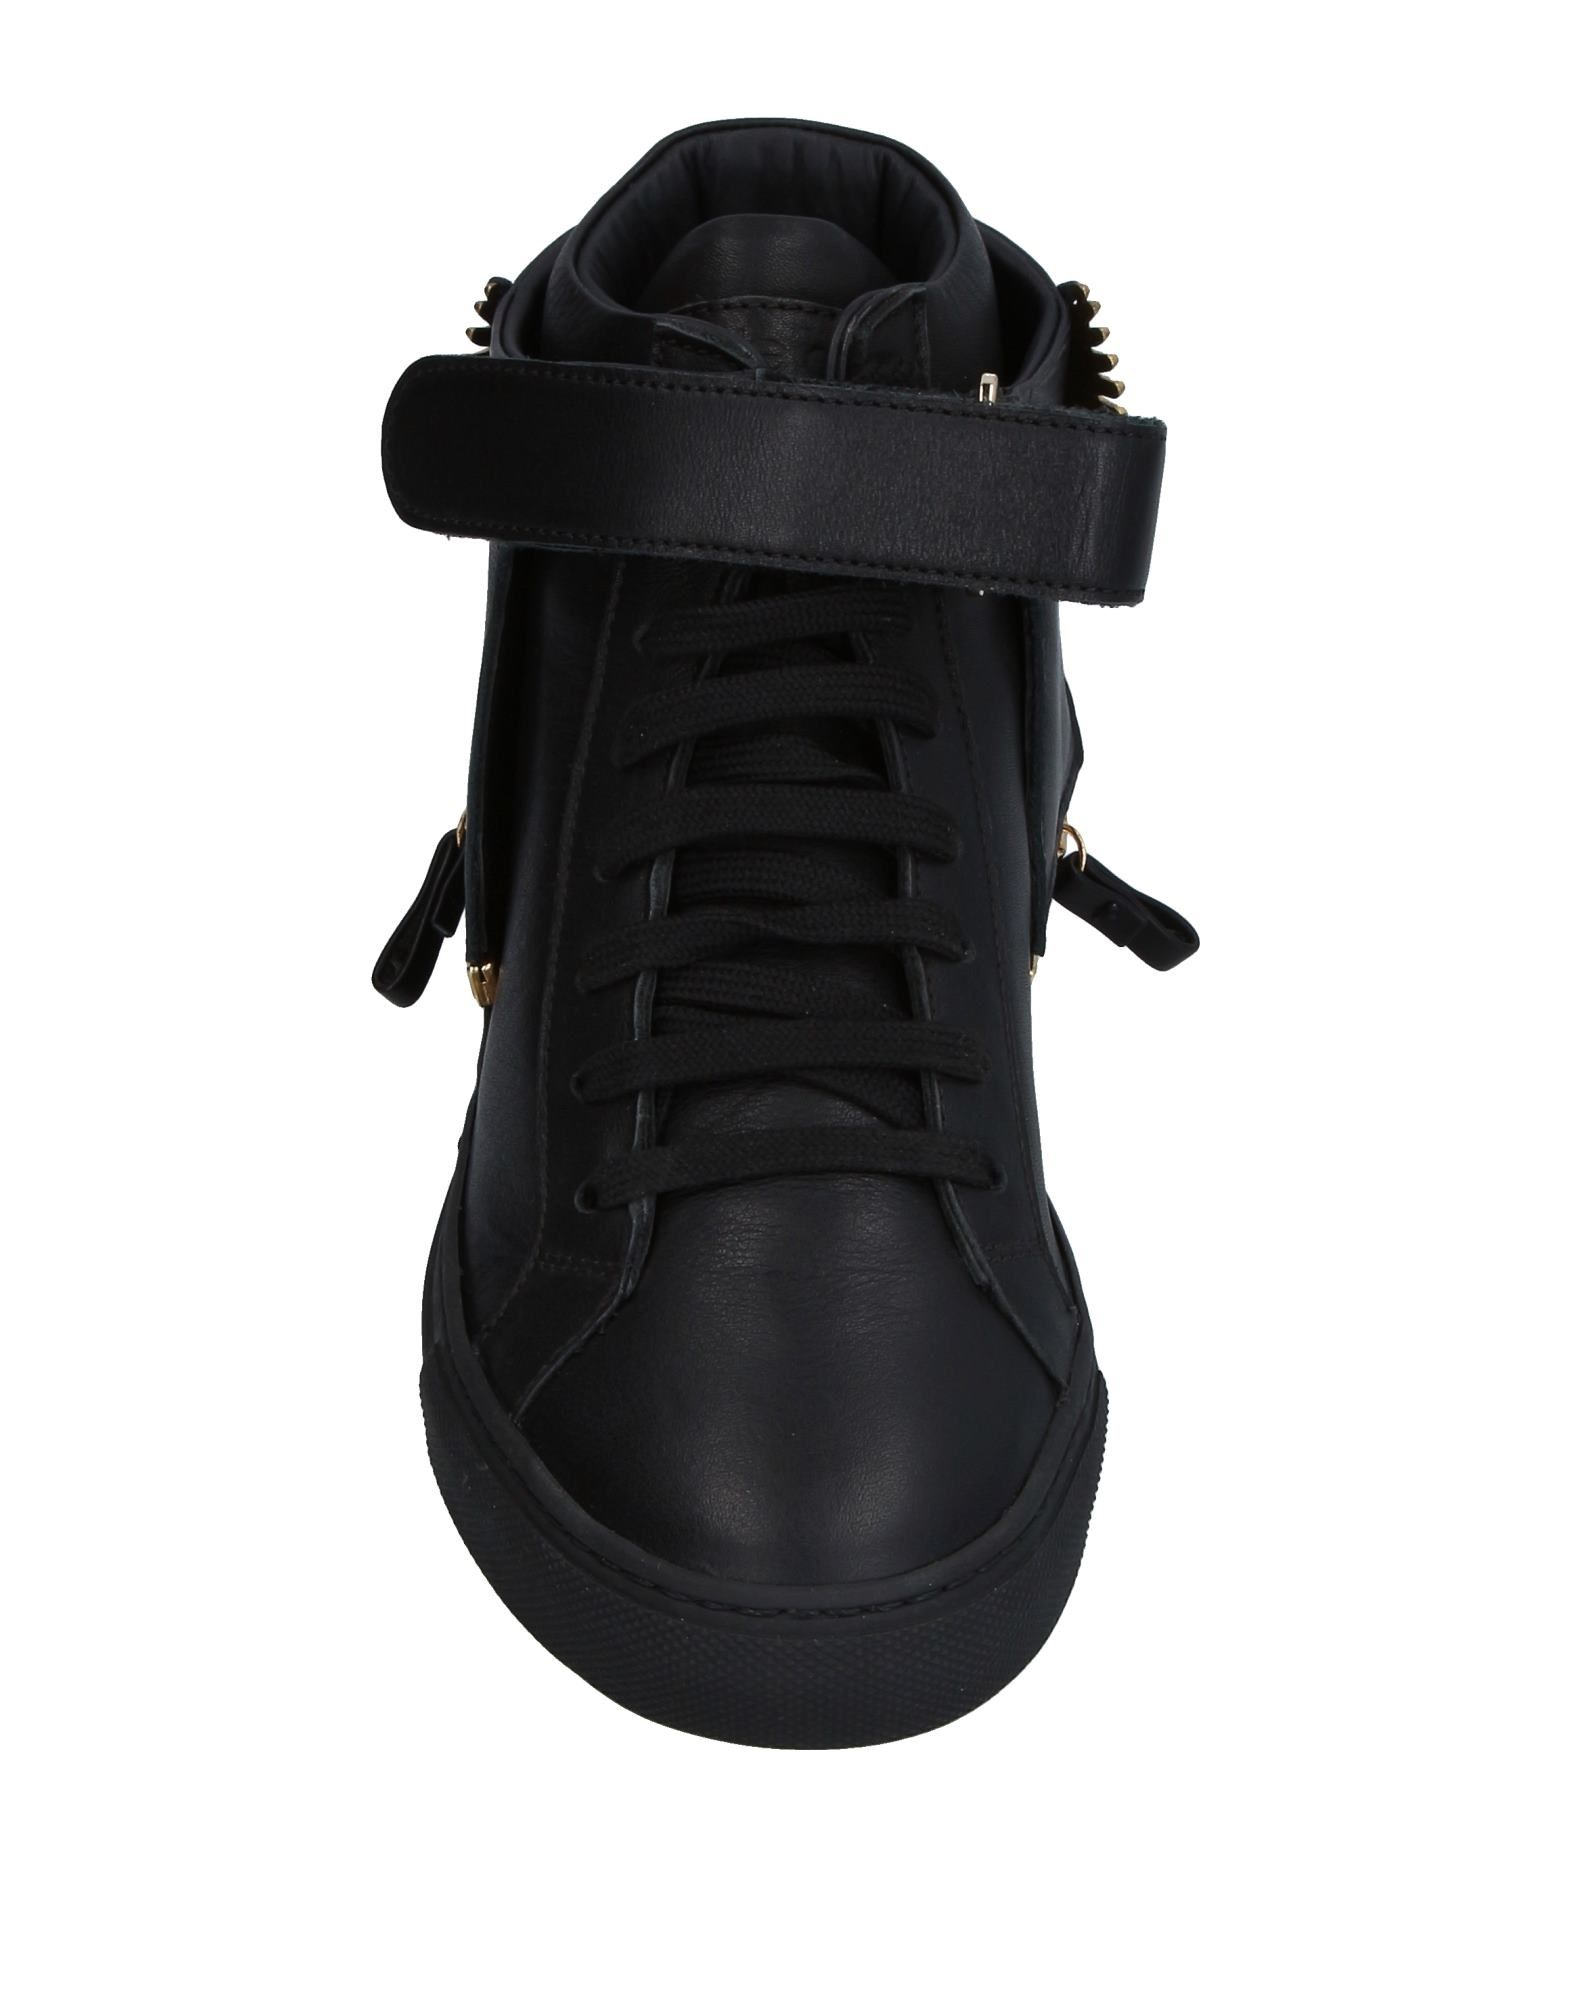 Gut um 11236989CO billige Schuhe zu tragenD 11236989CO um 708846